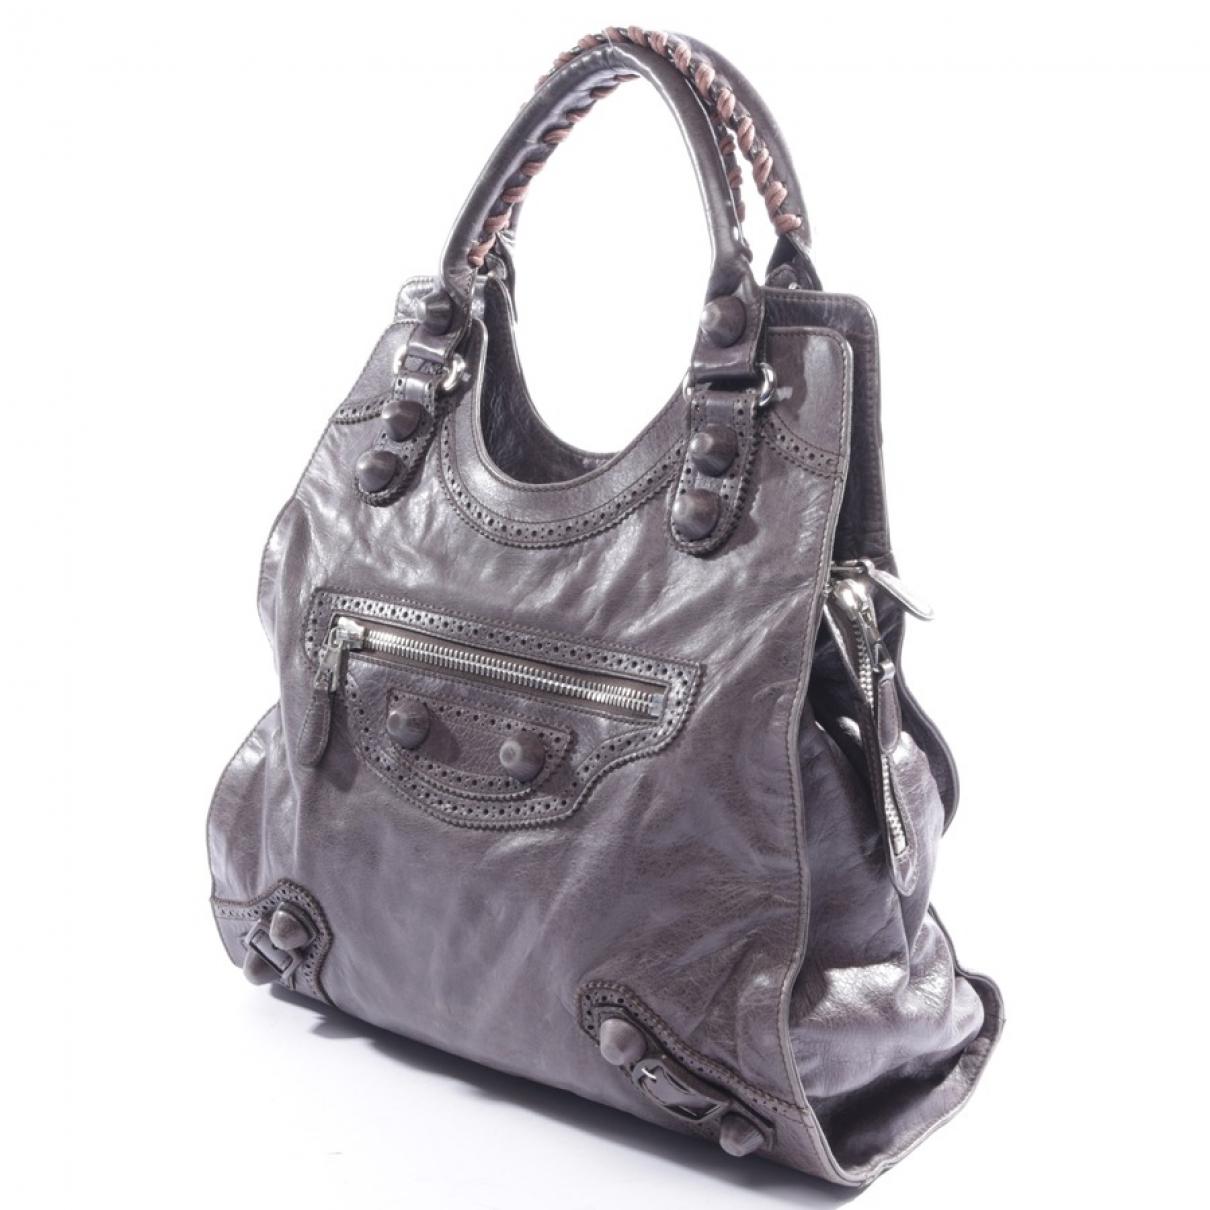 Balenciaga \N Brown Leather handbag for Women \N